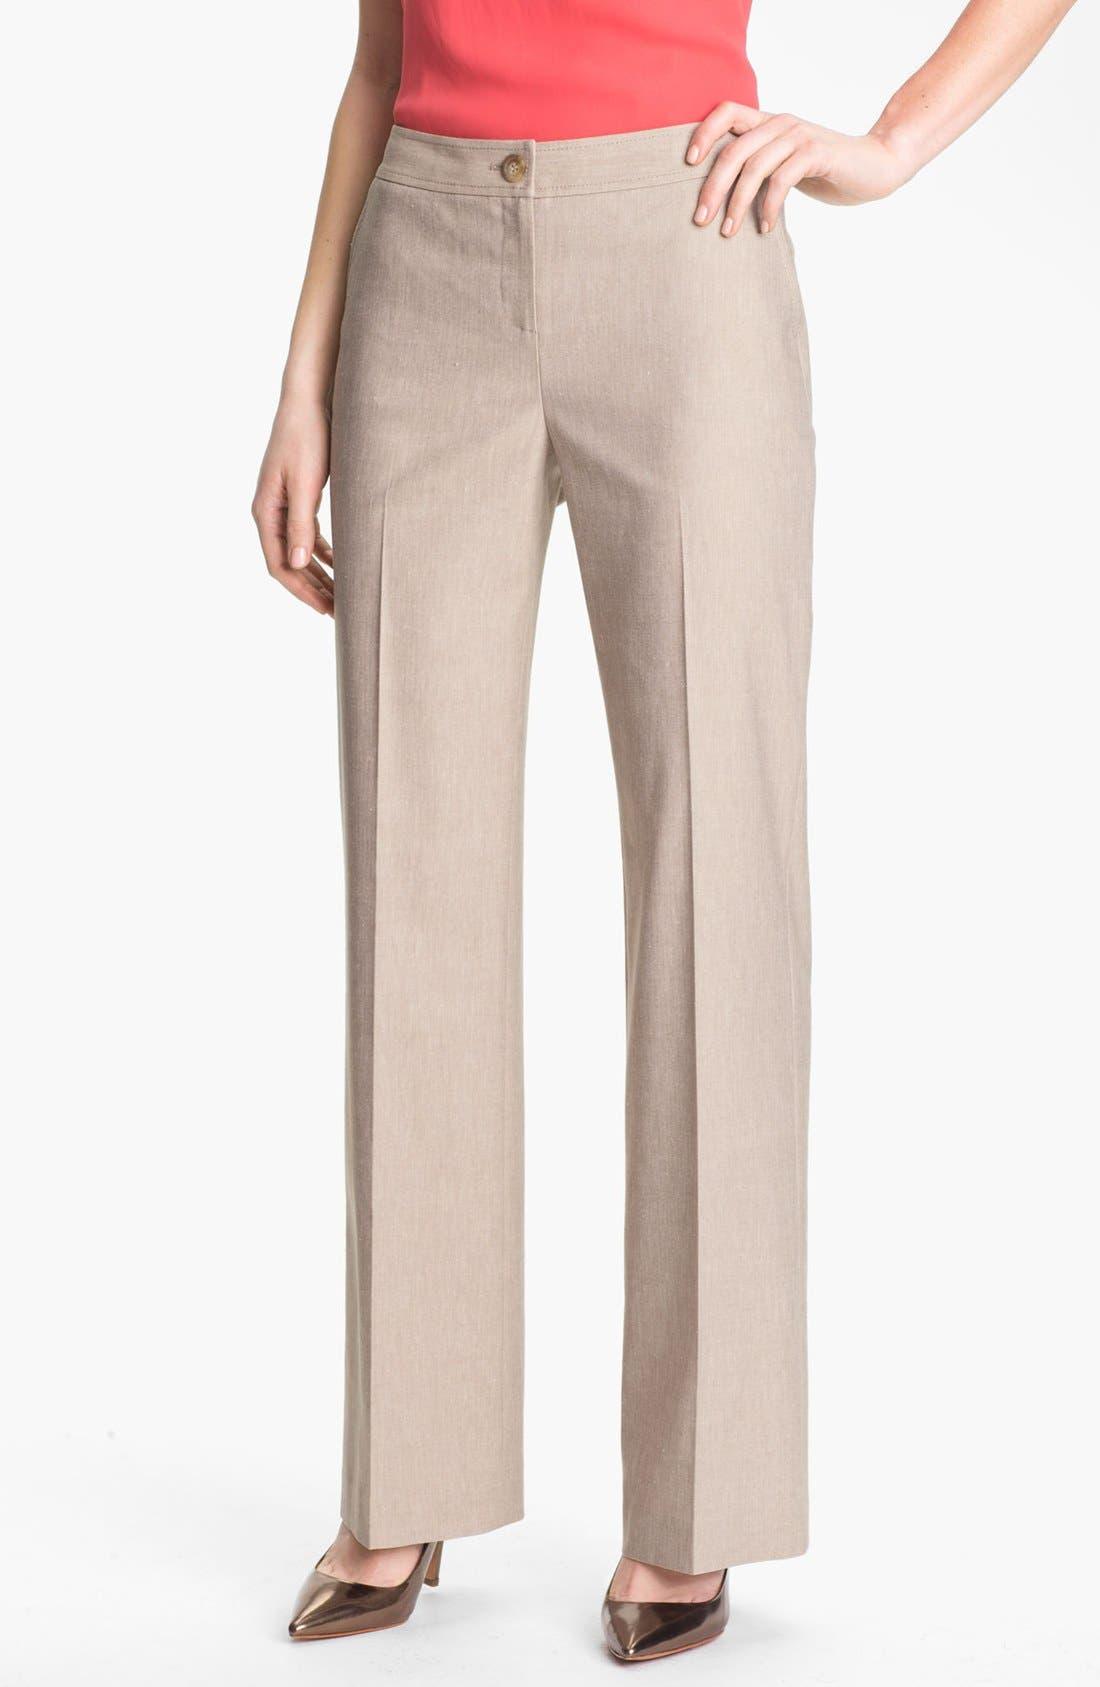 Alternate Image 1 Selected - Halogen® 'Taylor' Herringbone Curvy Fit Pants